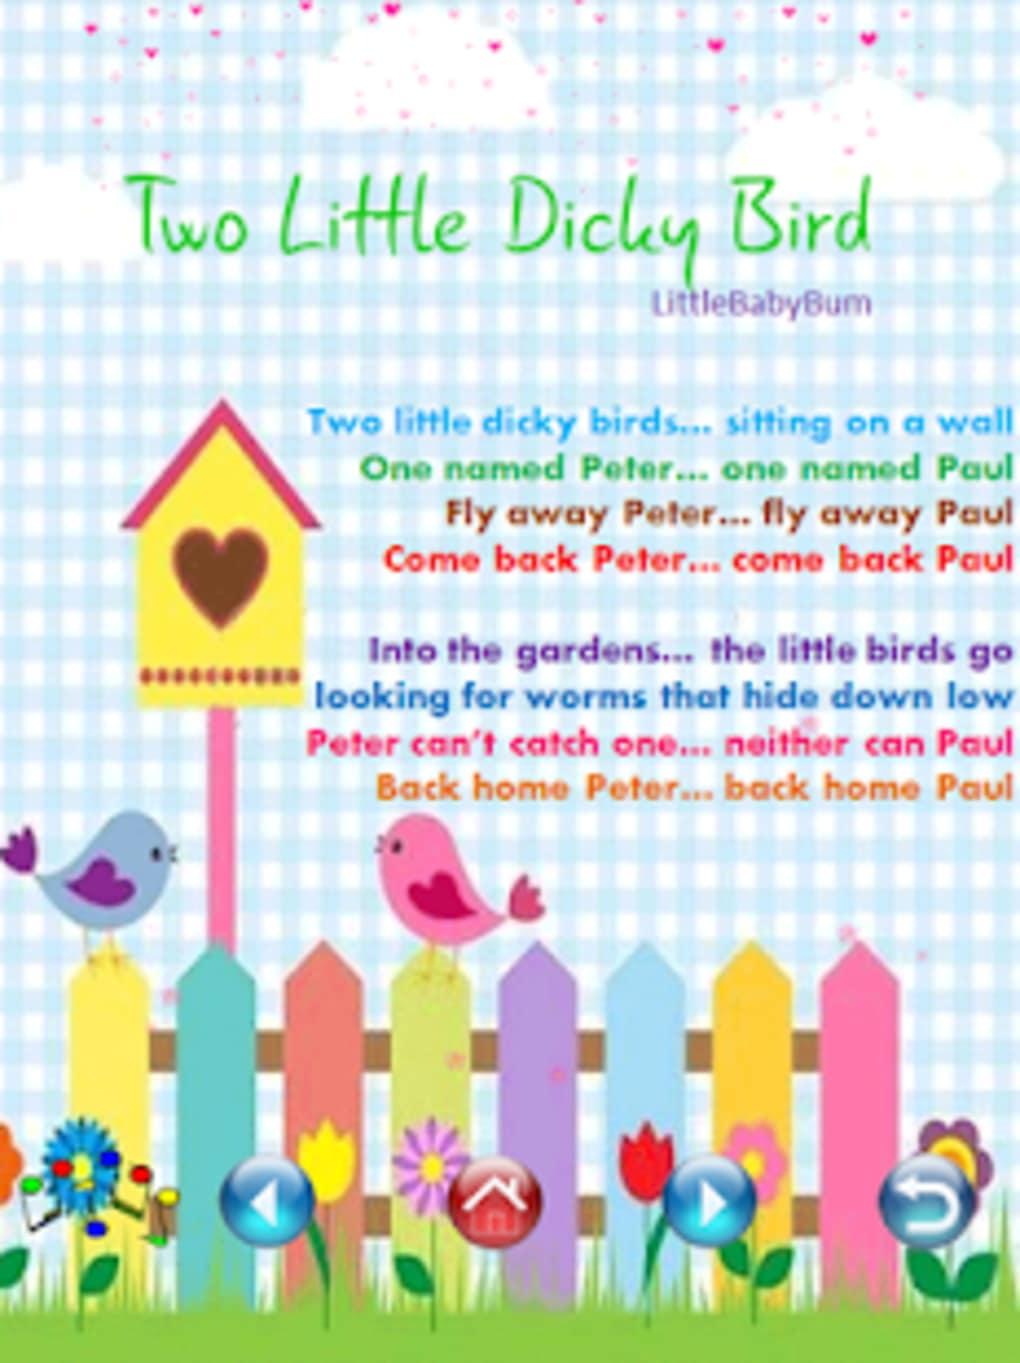 Kids Songs Best Nursery Rhymes Free App for Android - Download